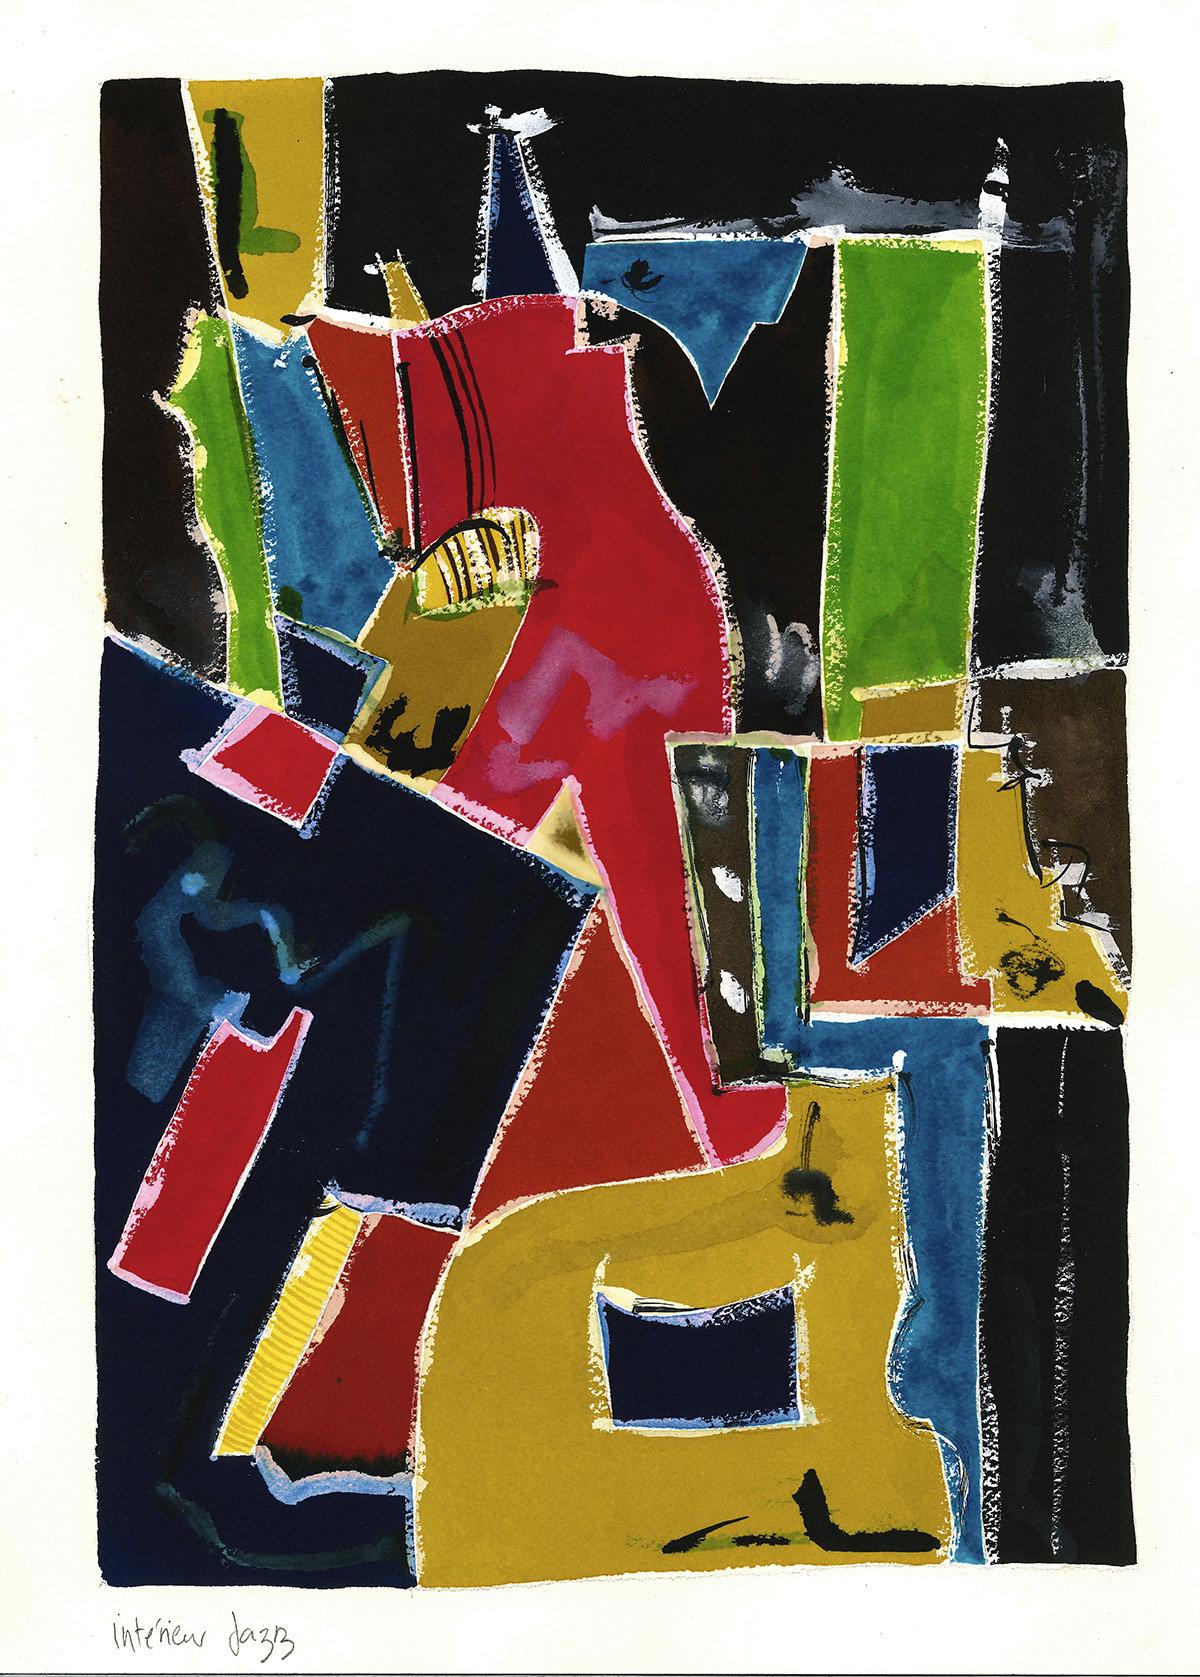 Intérieur Jazz › Patrick Vernon